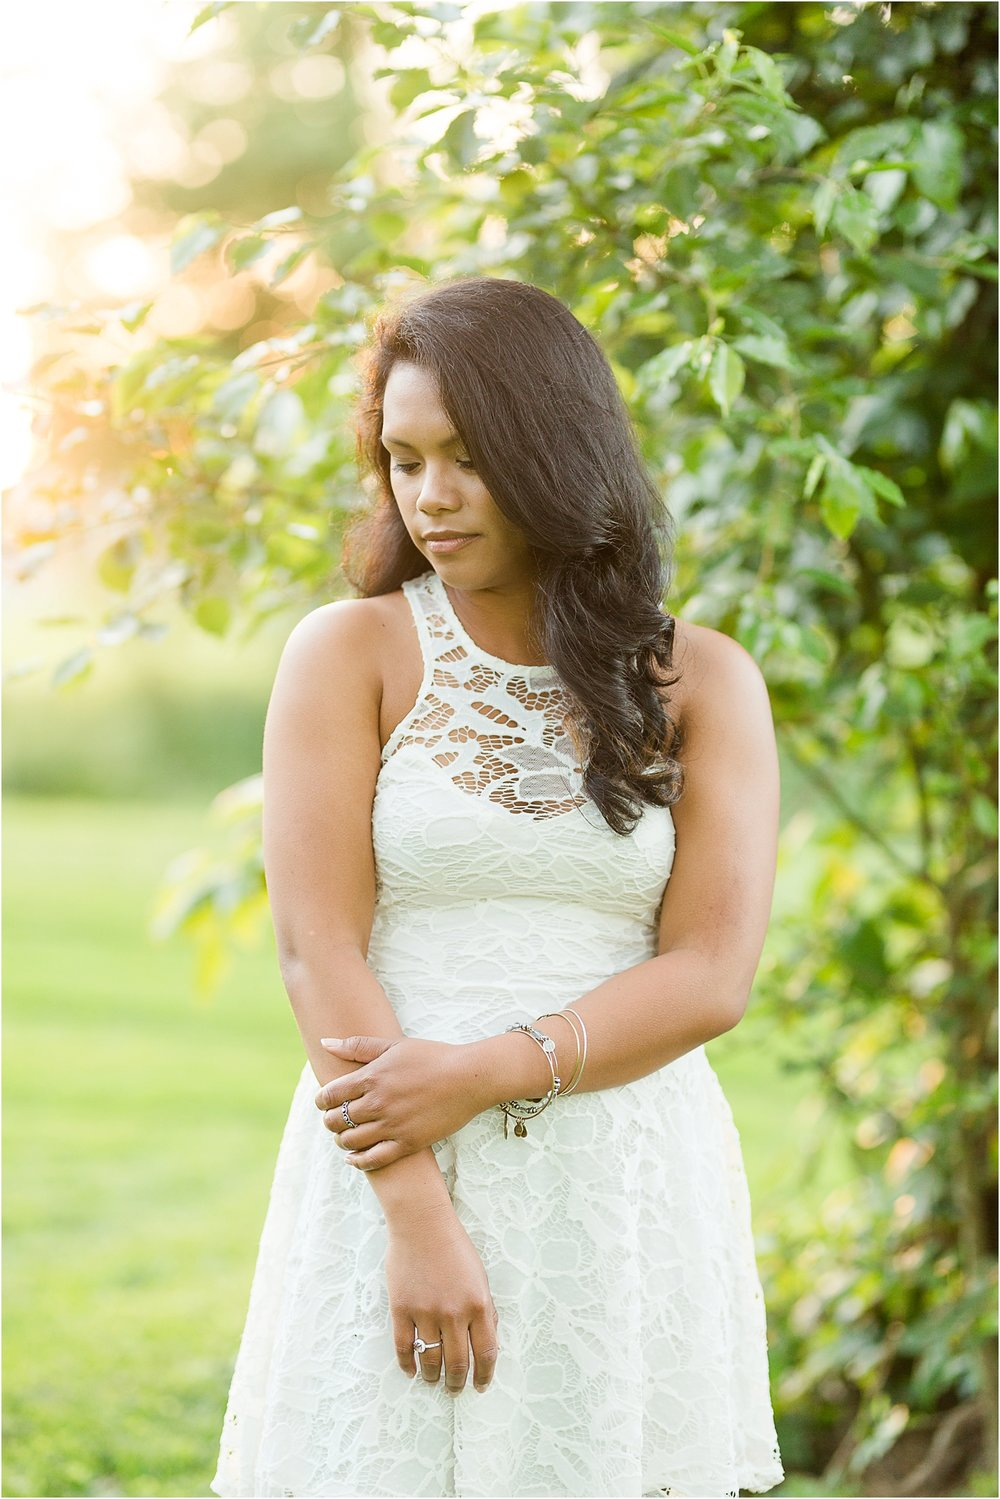 Jenna-Senior-2017-317-graduation-photos.jpg